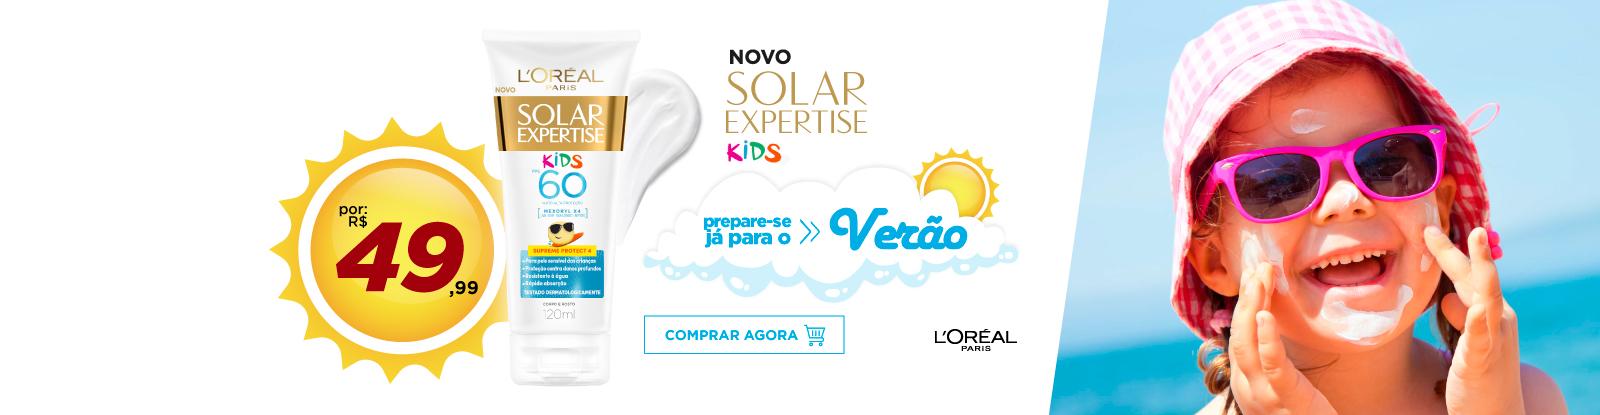 Solar-Kids